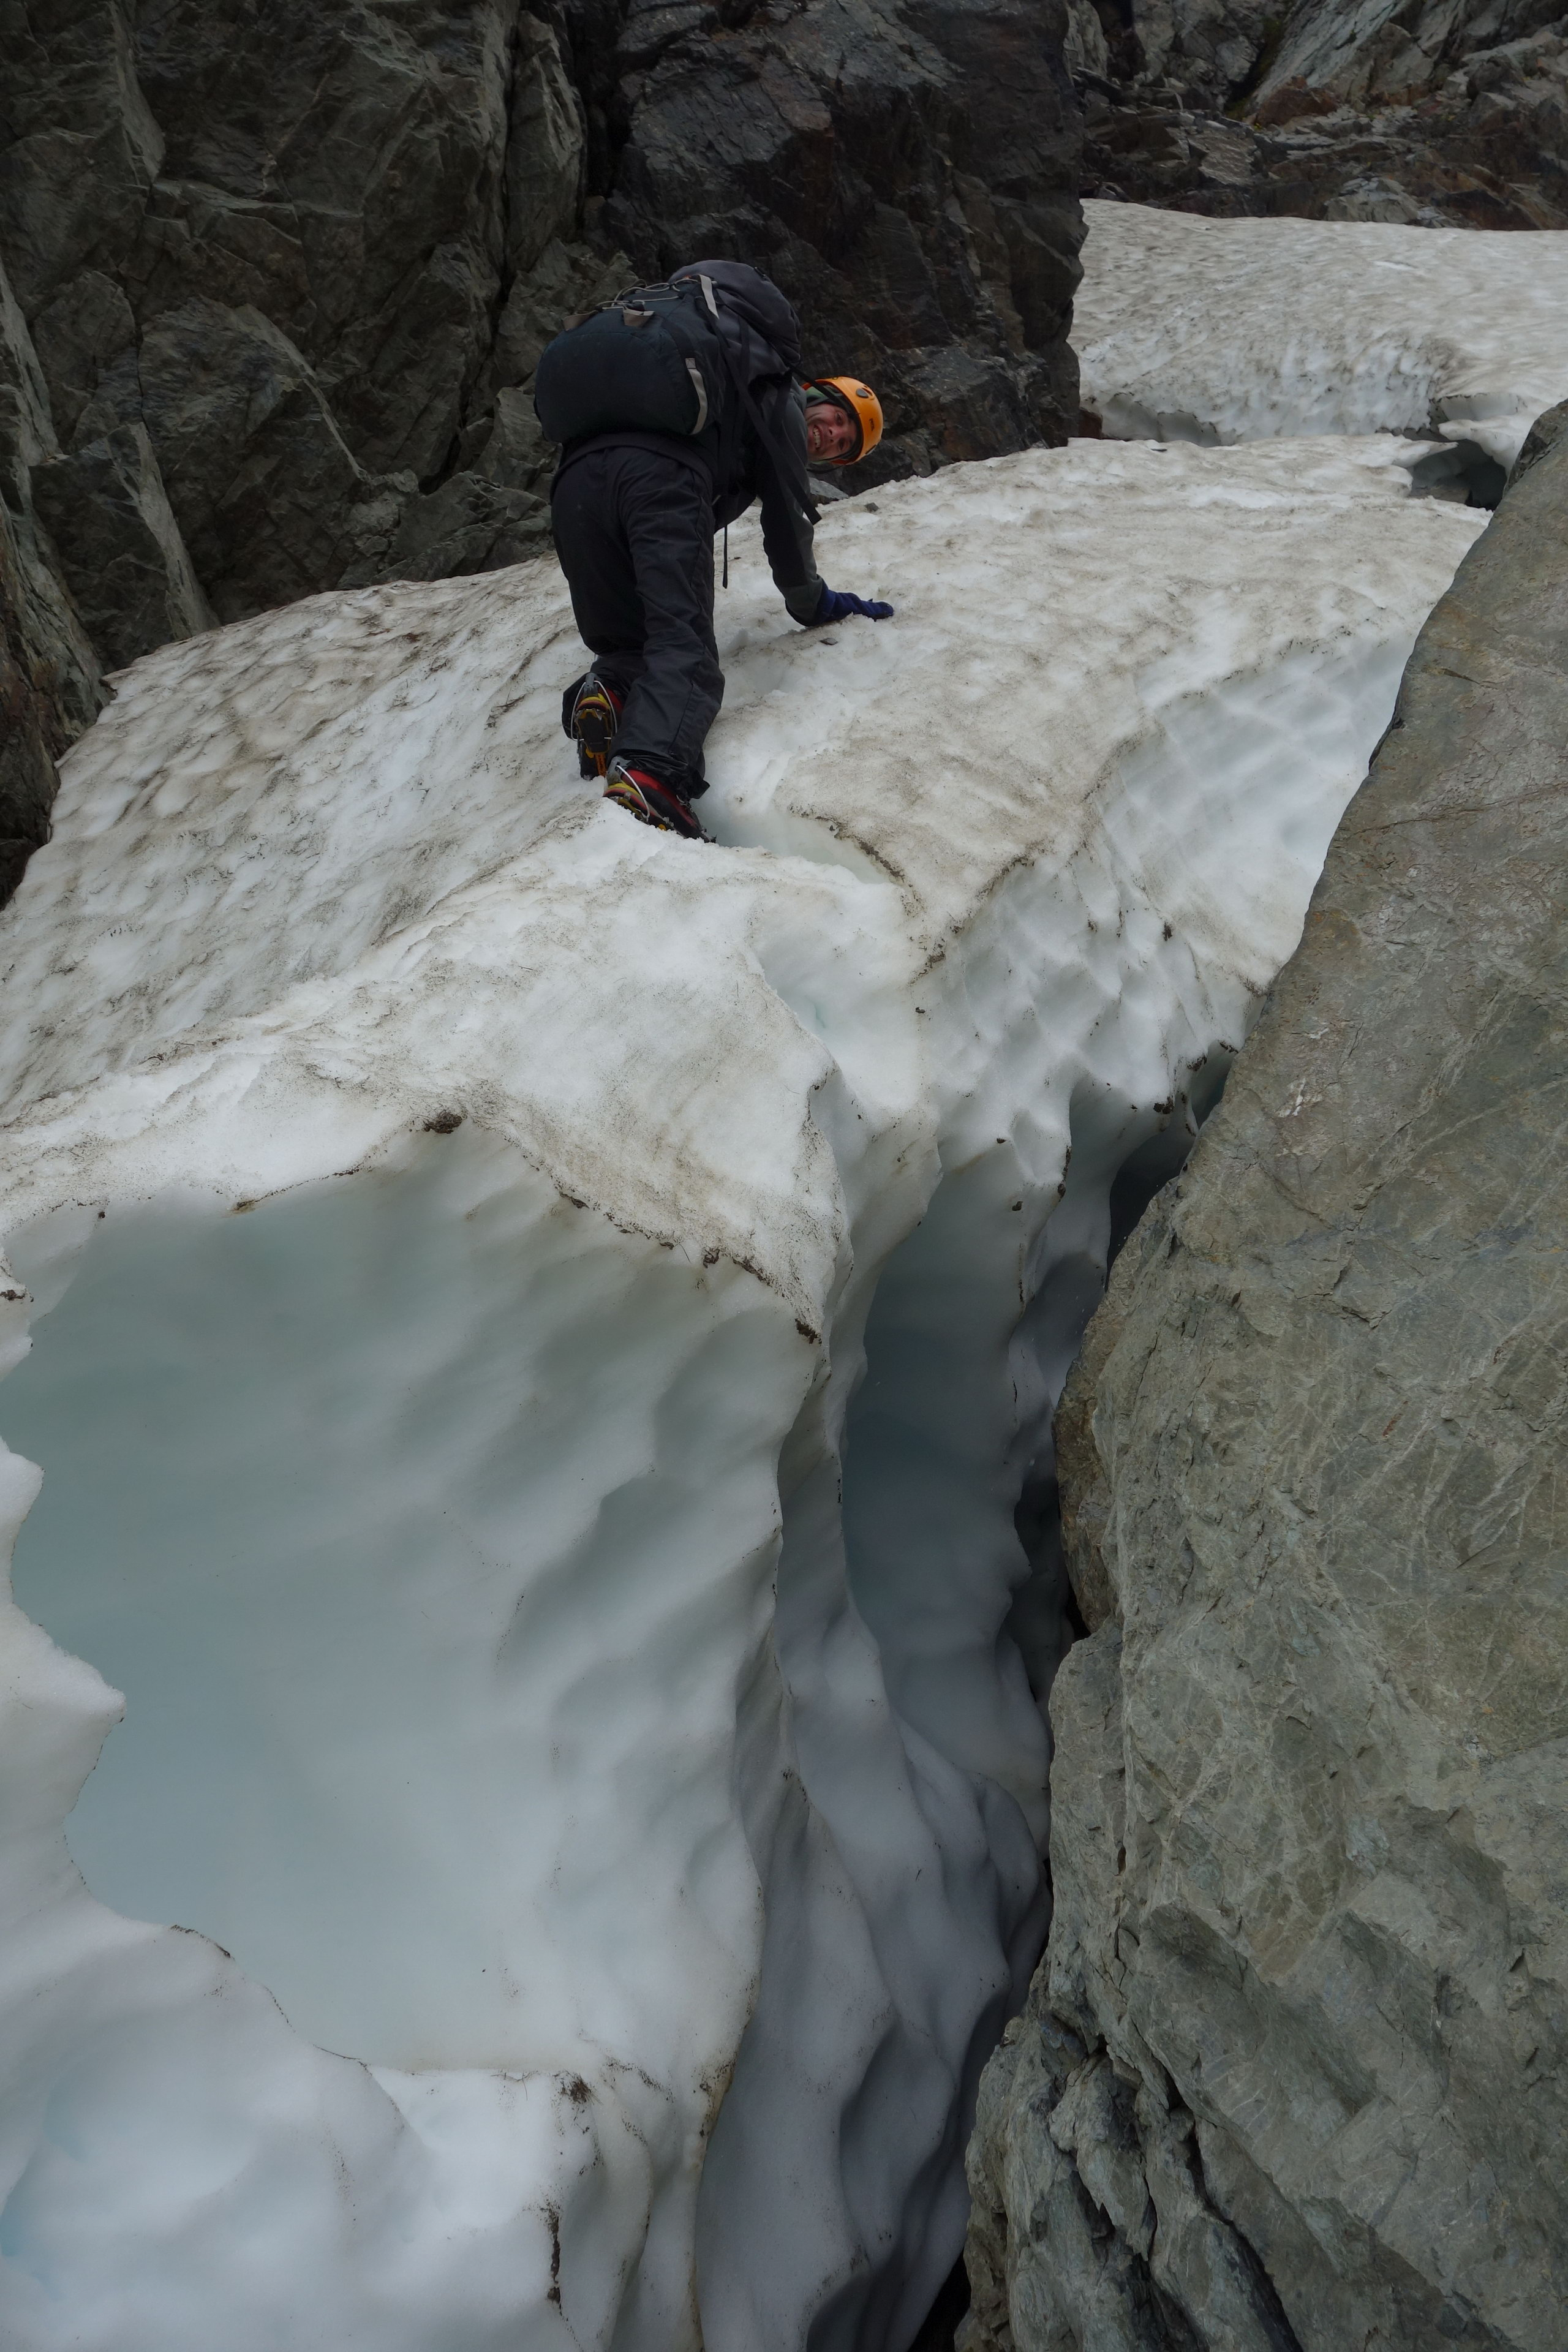 Mikey descending on snow (Ball Pass Dec 2013)